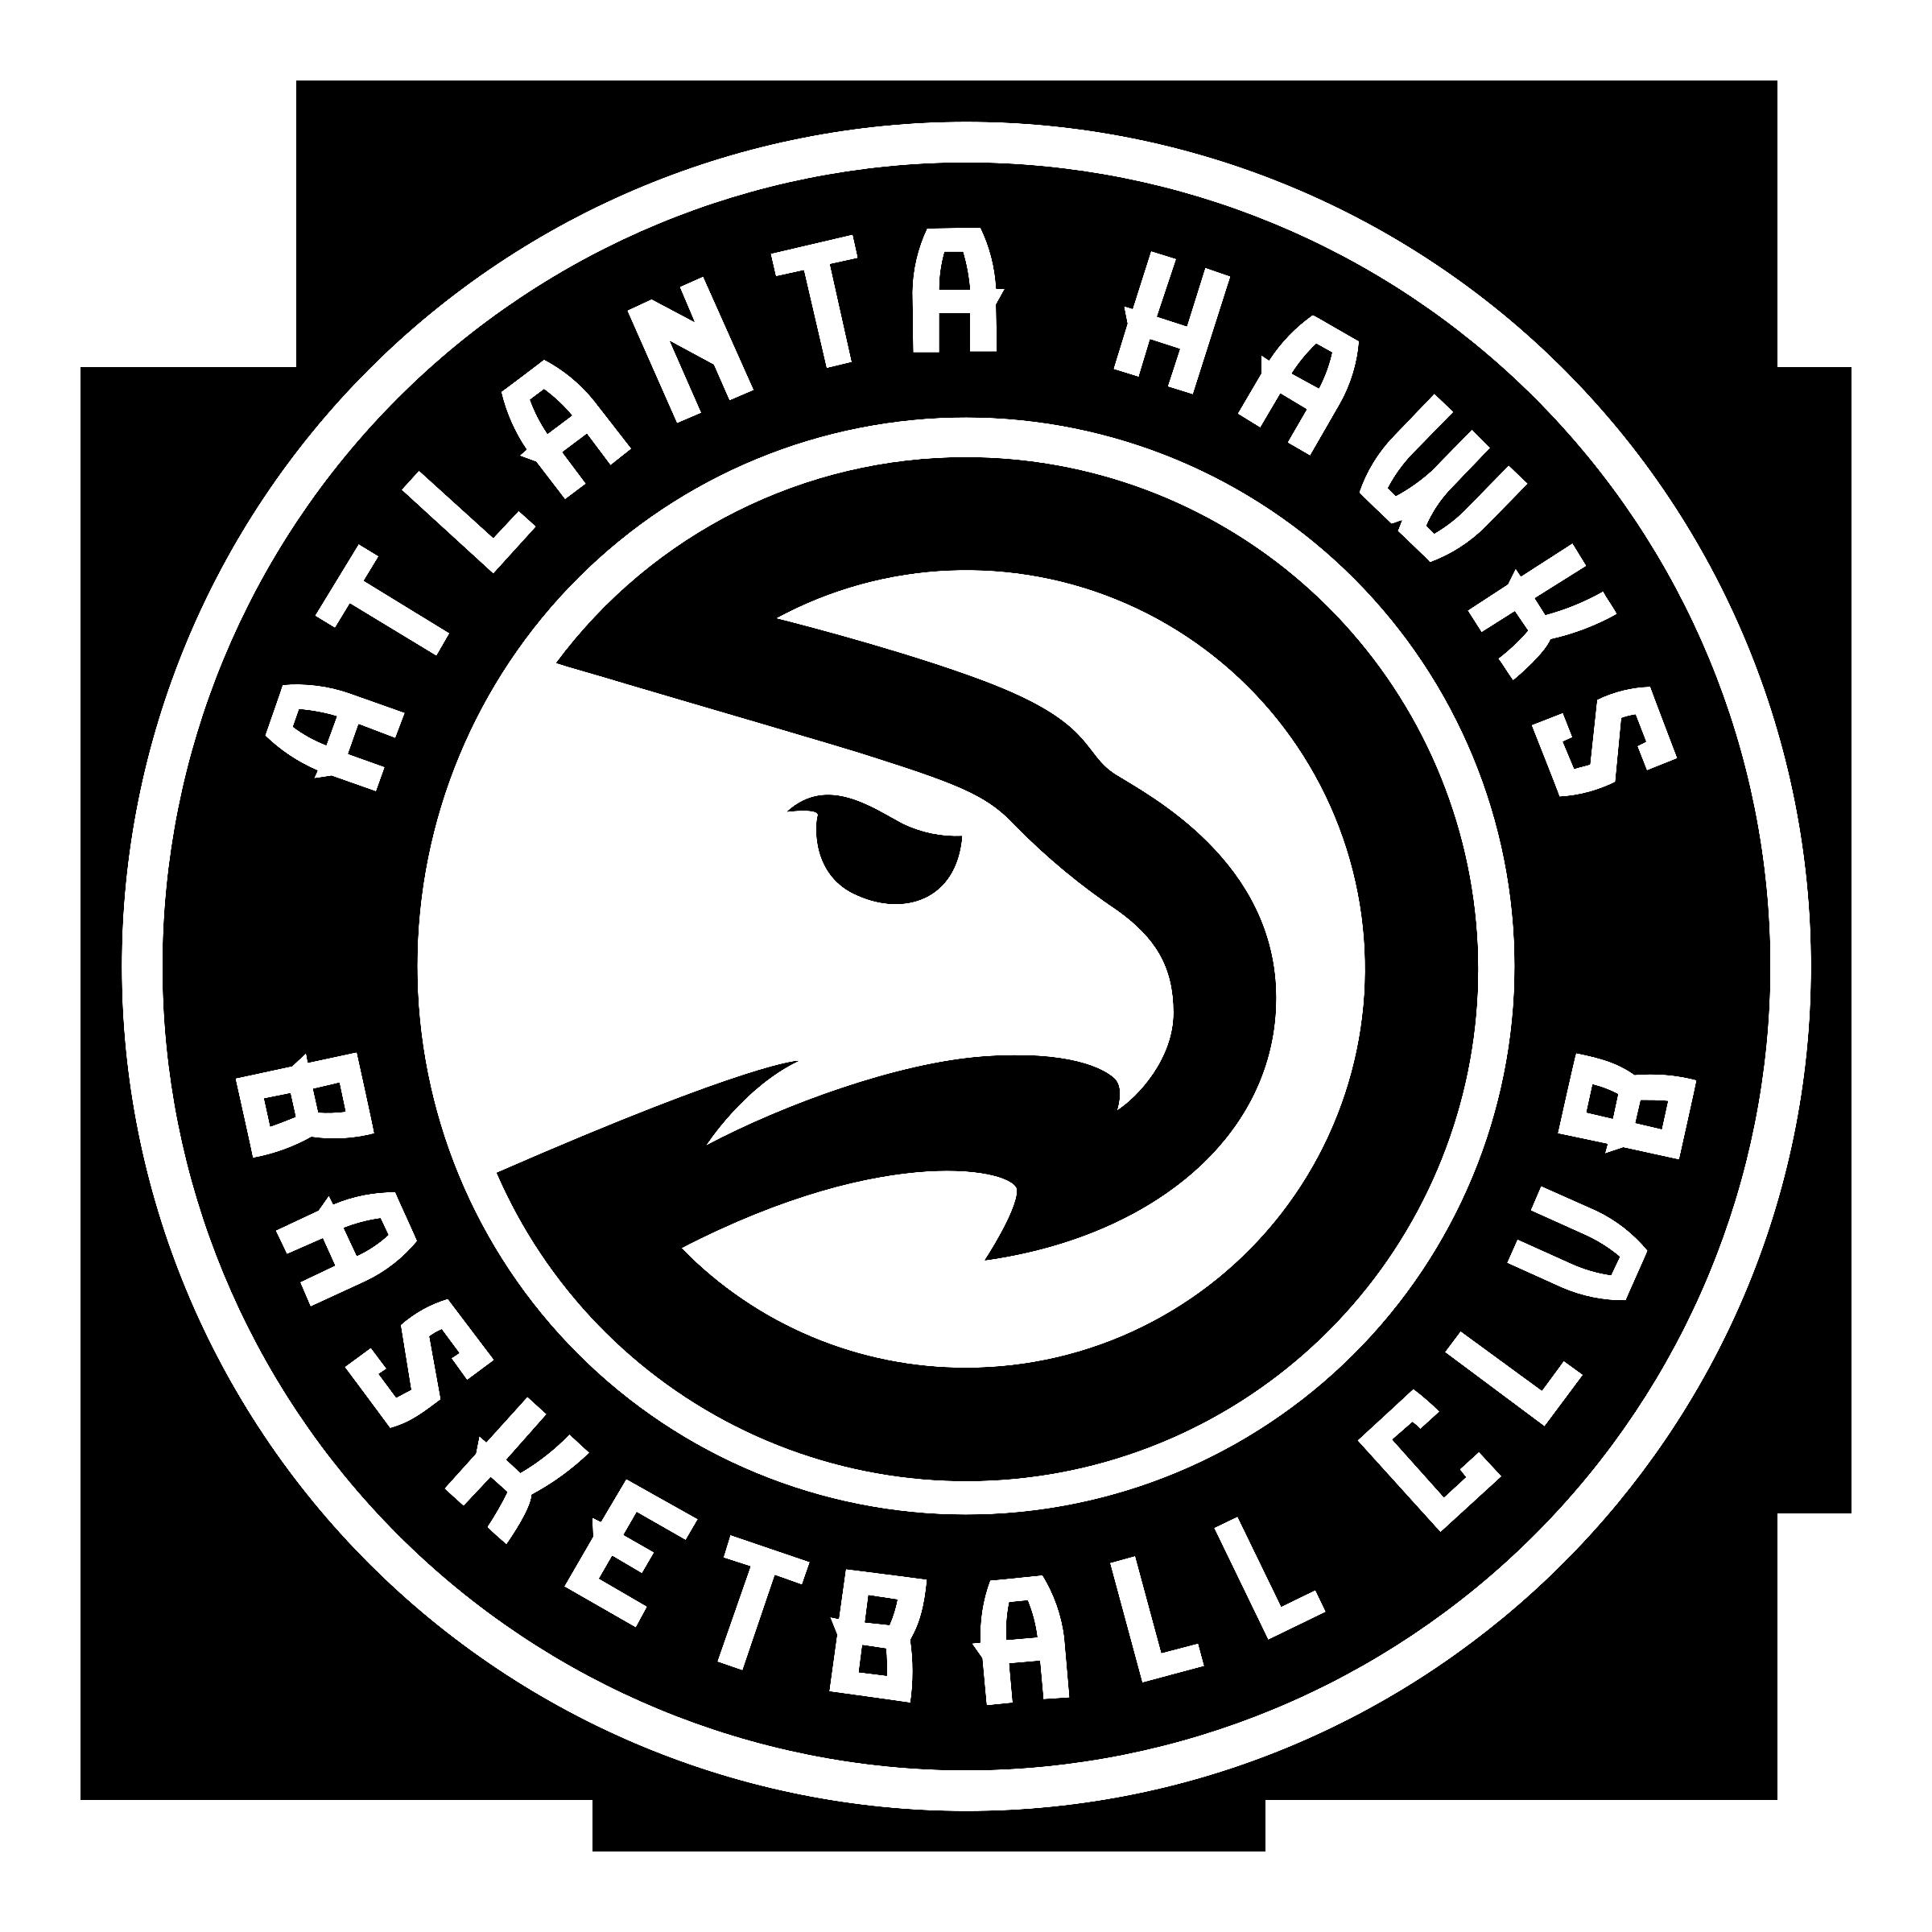 Atlanta Falcons Colors Red >> Atlanta Hawks Logo PNG Transparent & SVG Vector - Freebie Supply